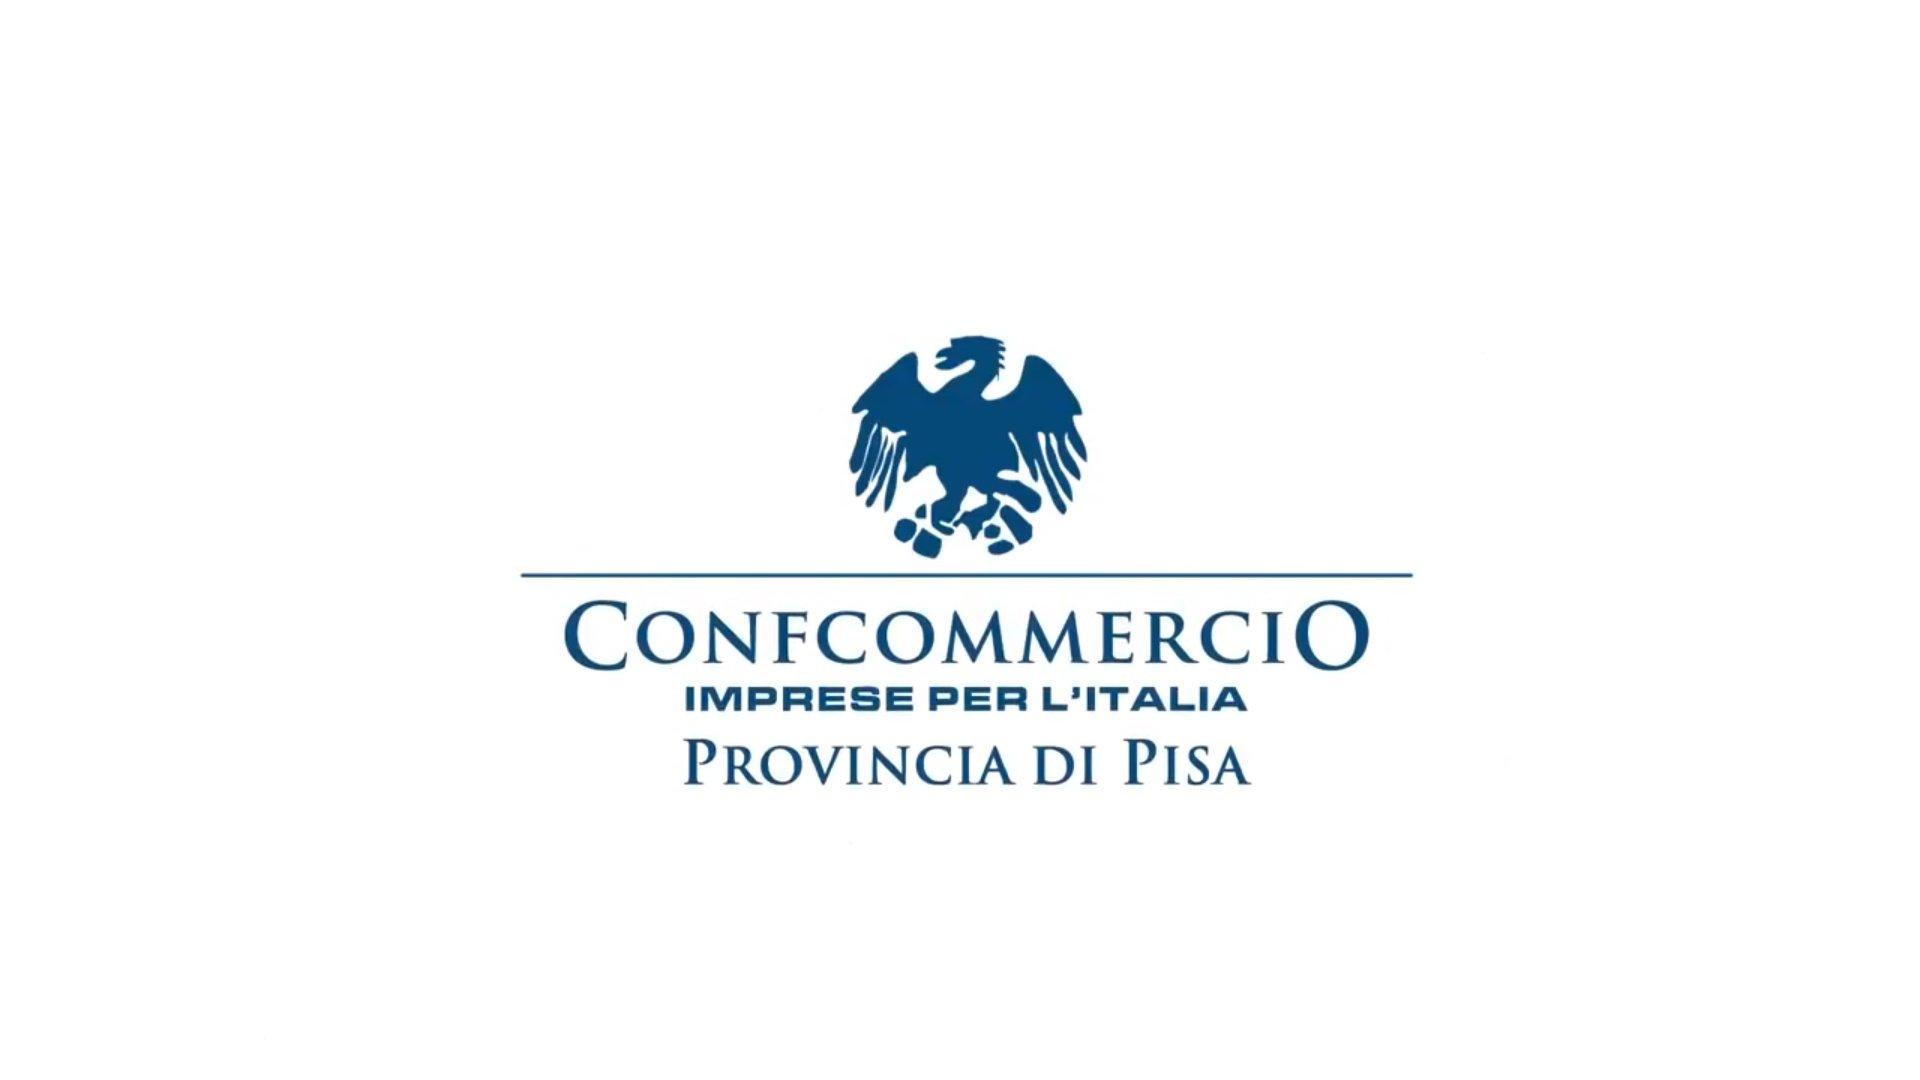 Logo confcommercio pisa